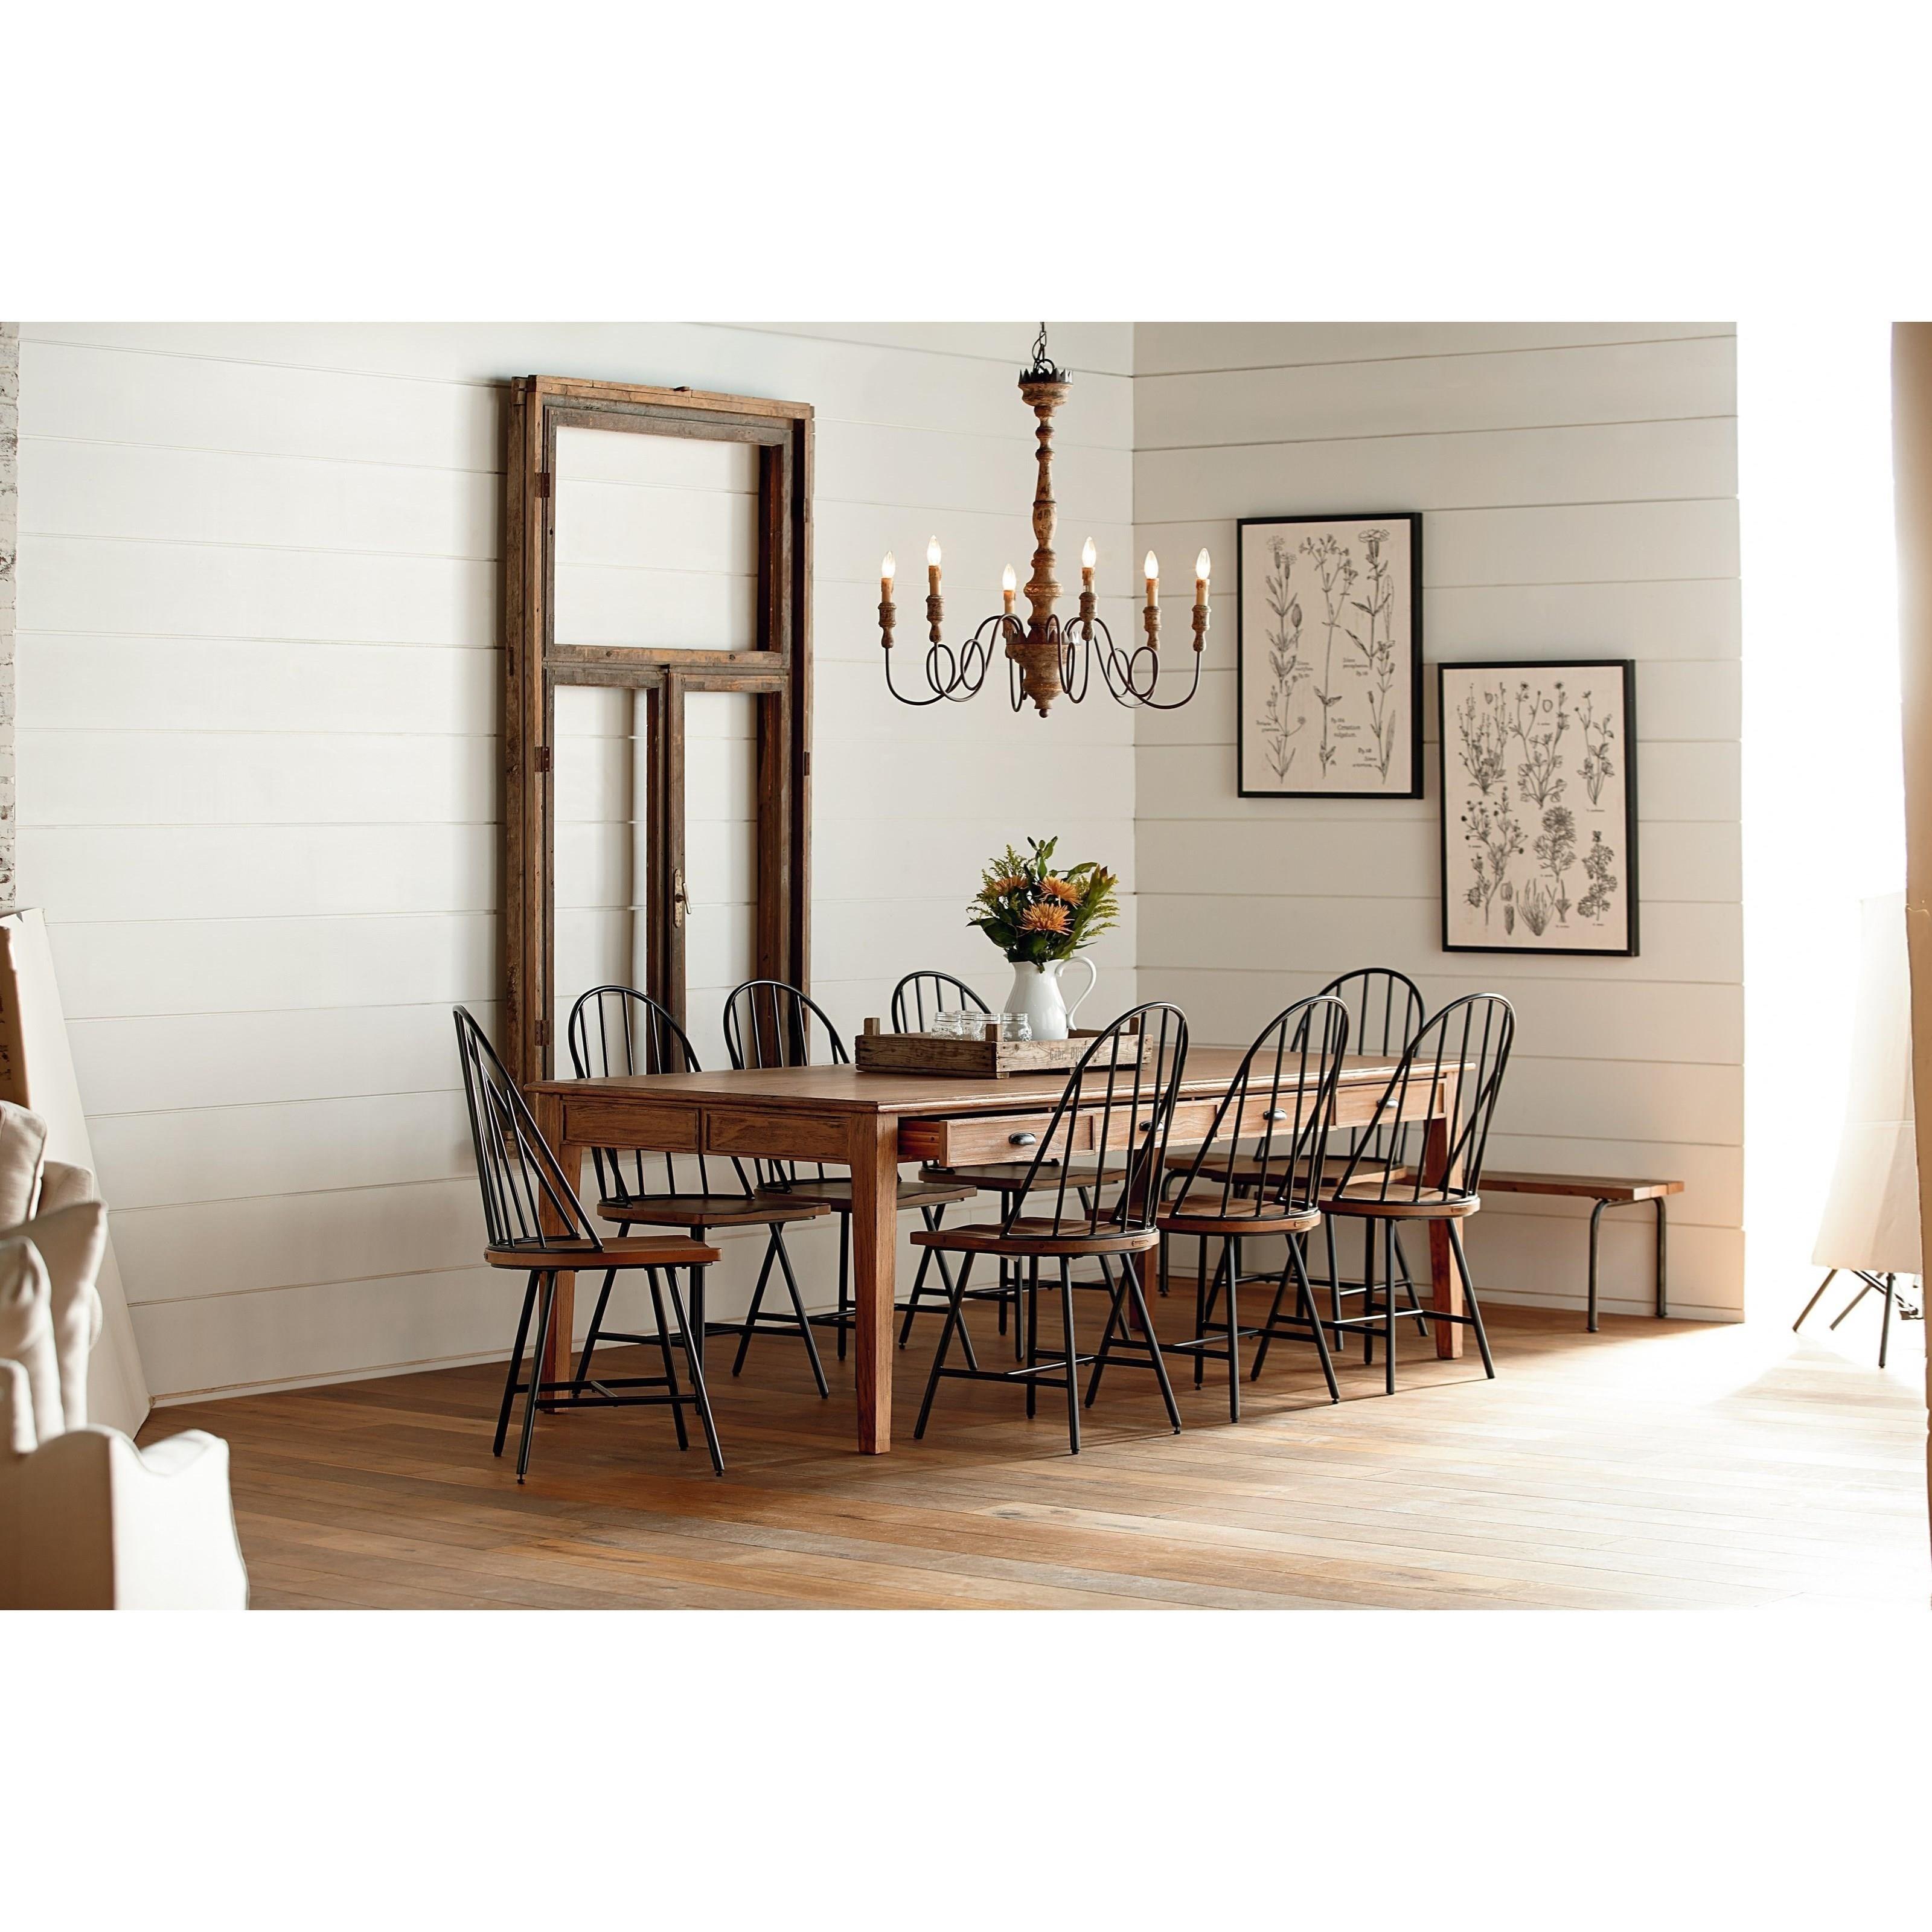 Magnolia home by joanna gaines farmhouse dining table with for Magnolia farmhouse